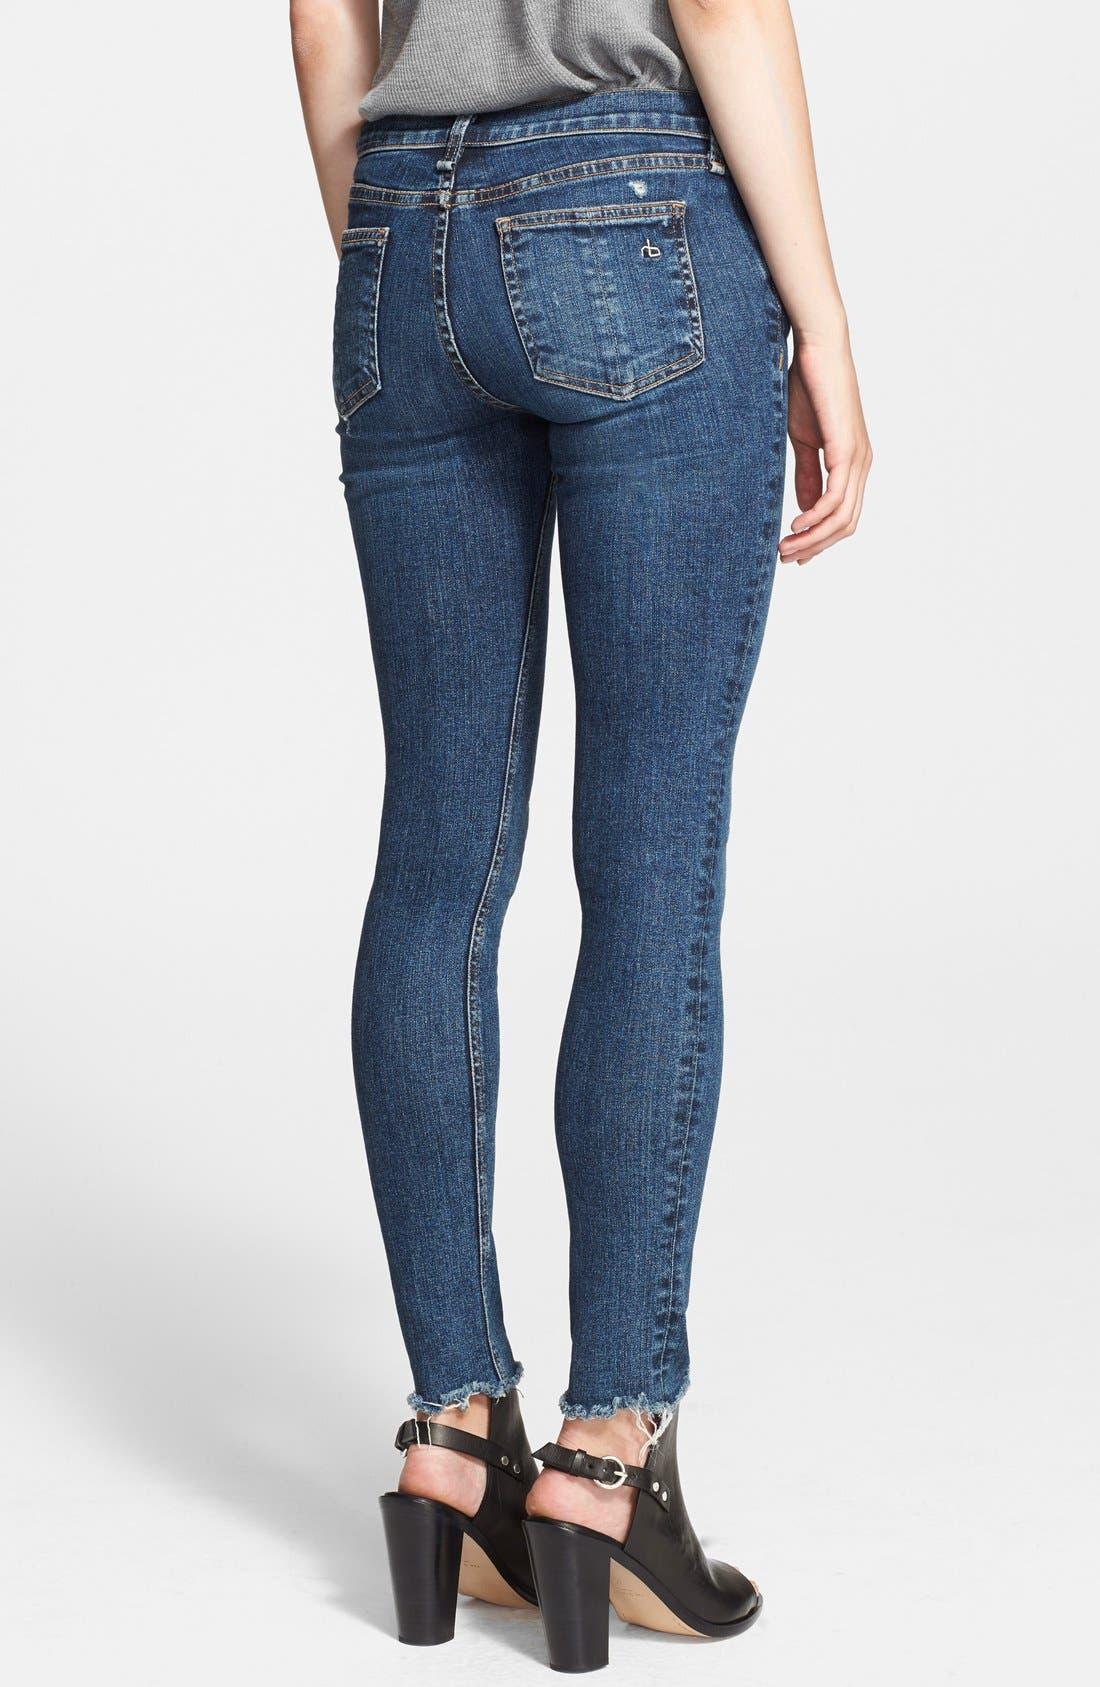 Alternate Image 2  - rag & bone/JEAN 'The Skinny' Stretch Jeans (La Paz)